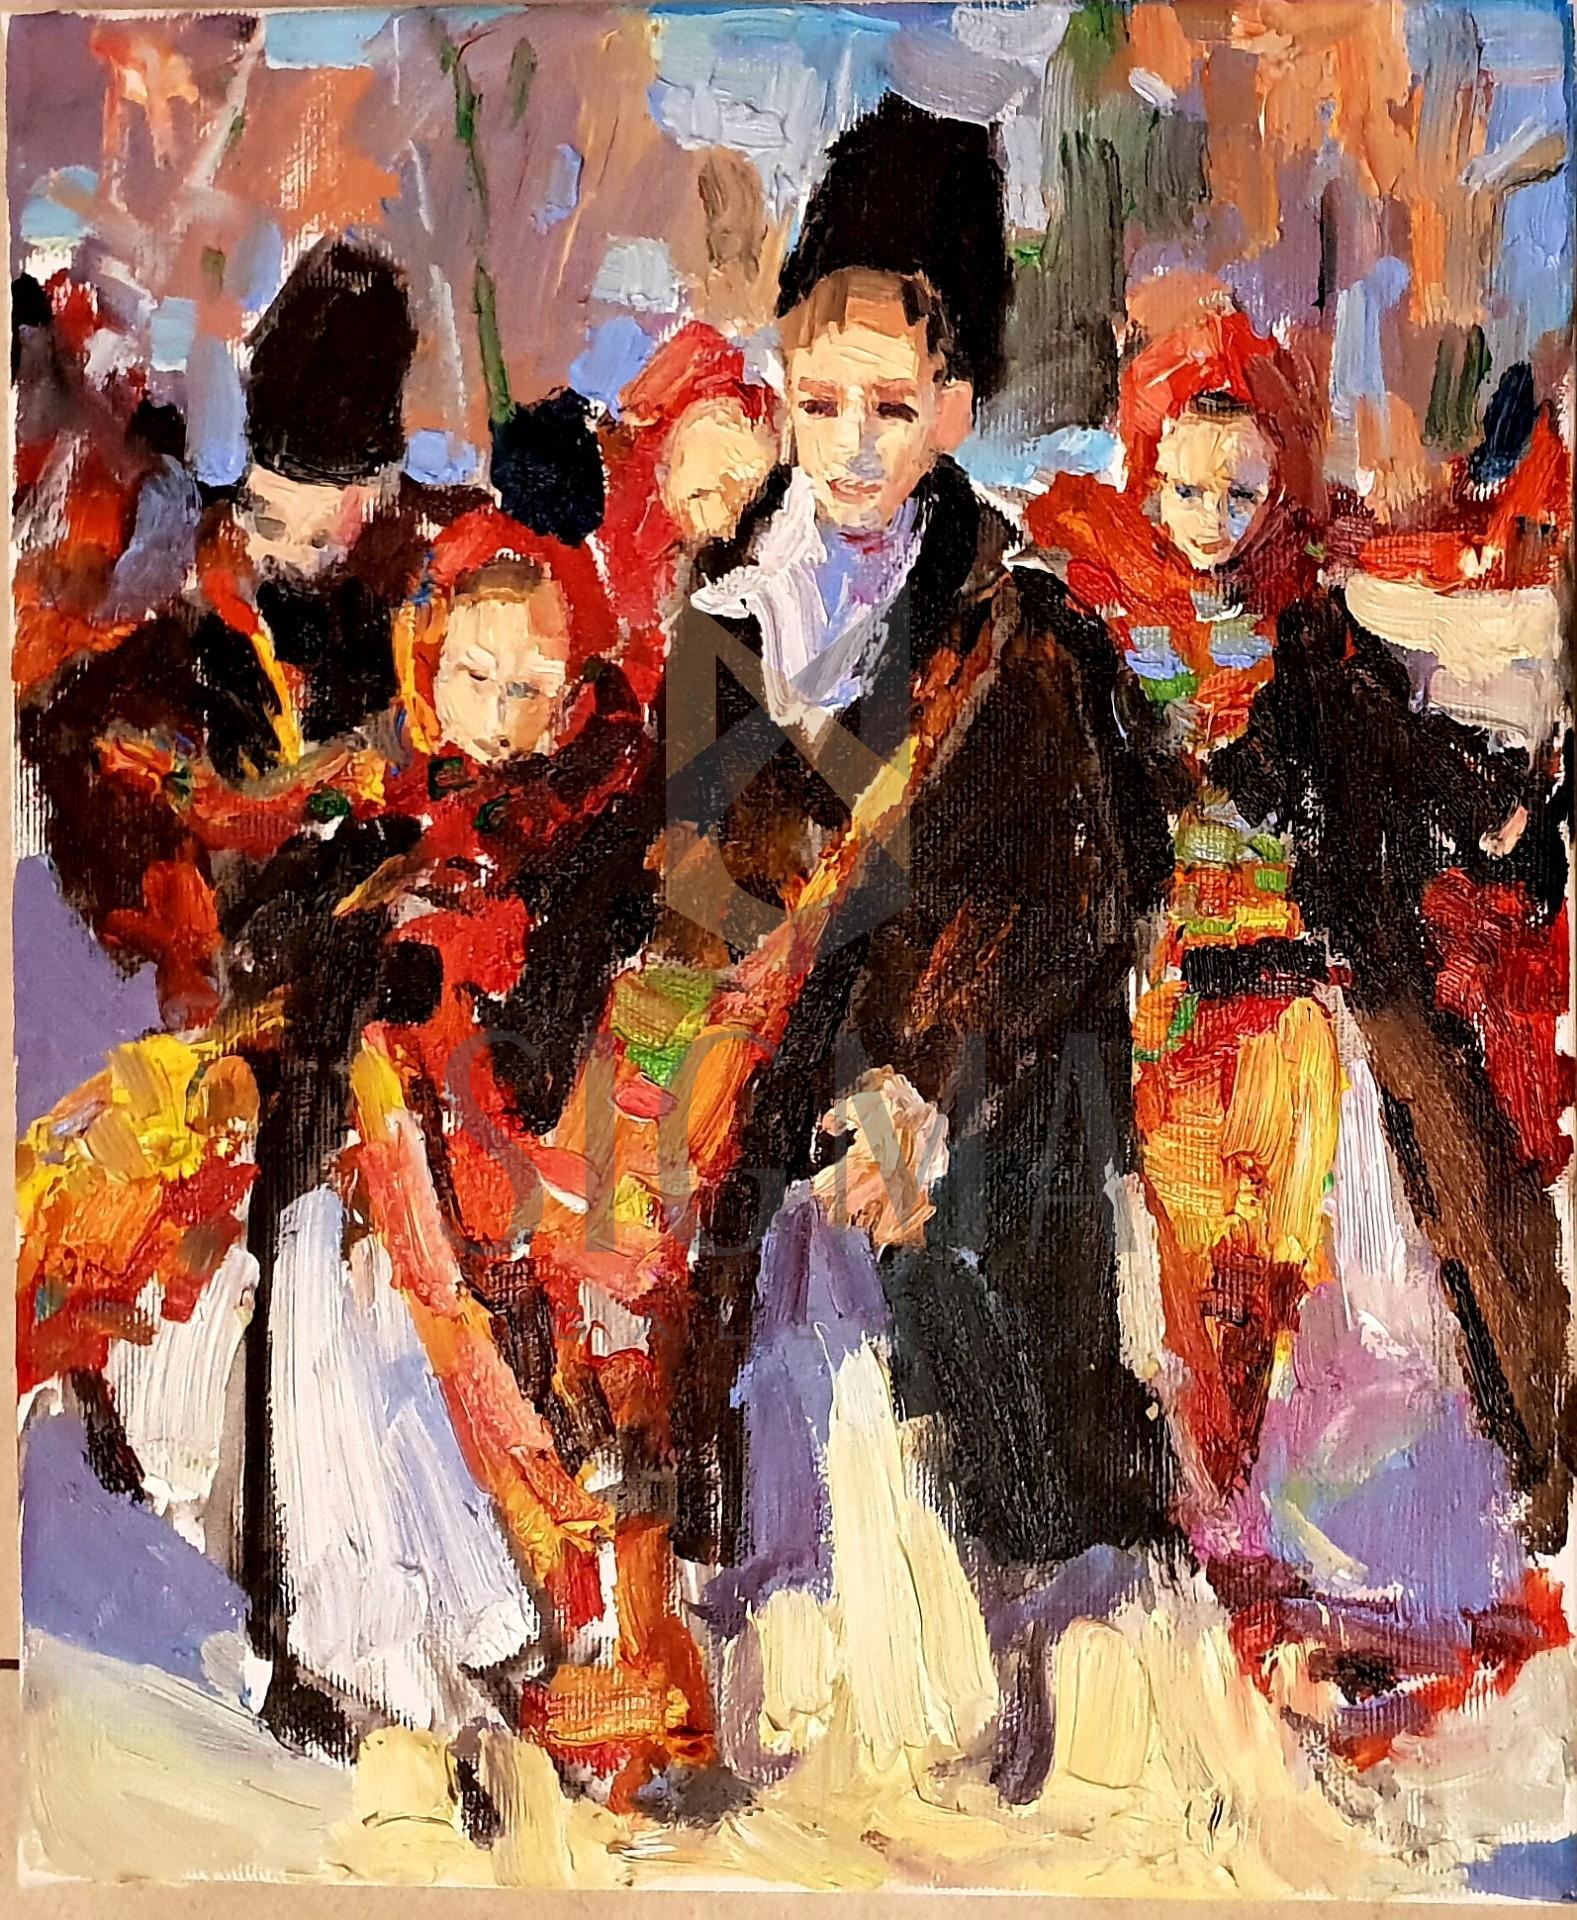 Tablou, Mariia Yughina, Traditii - Colindători, ulei pe pânză, 30 x 25 cm